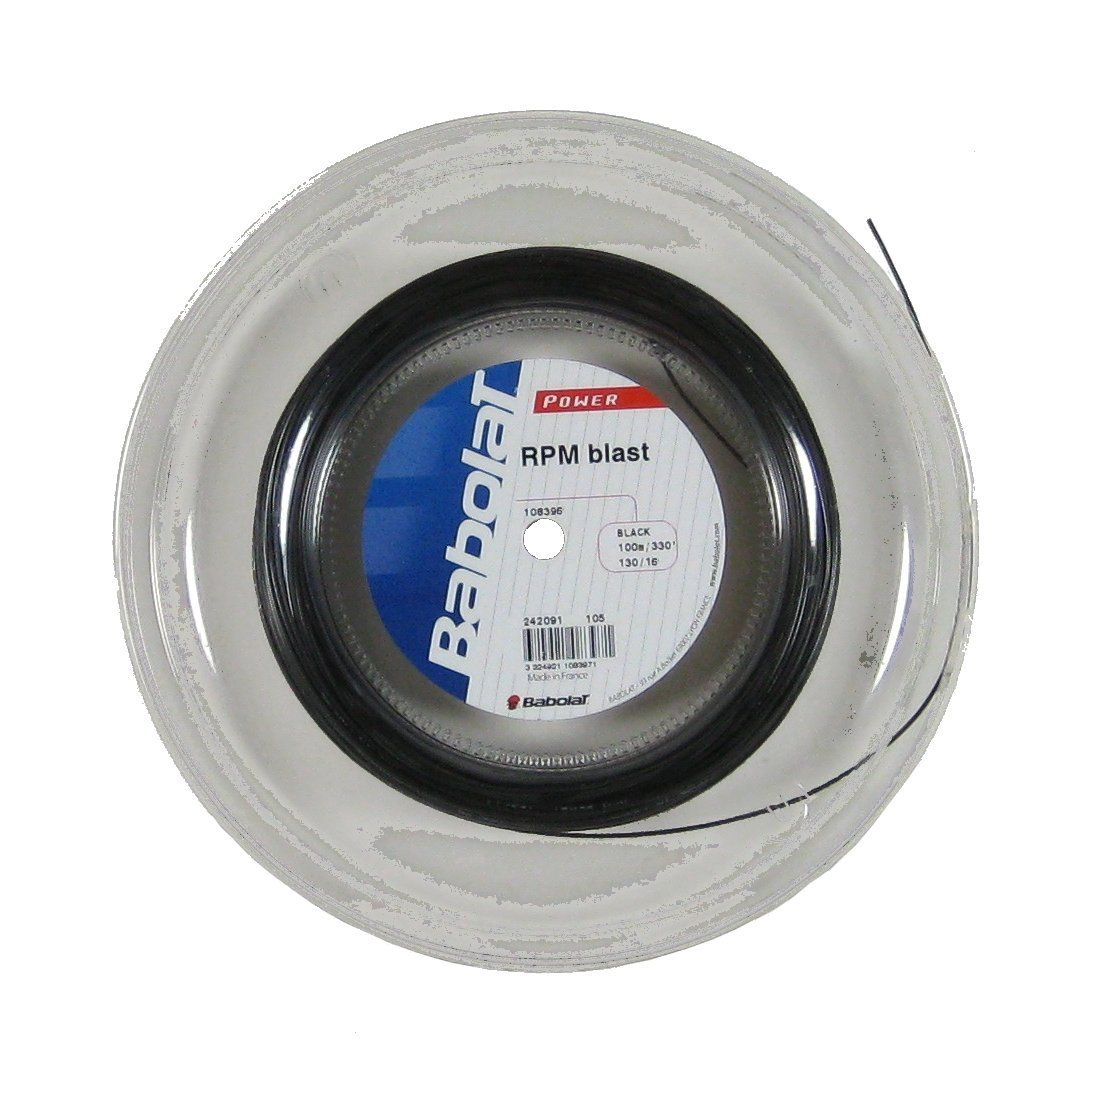 Babolat RPM Blast Tennis String - 100m / 330 feet Mini Reel - Choice of Gauge (16 Gauge)